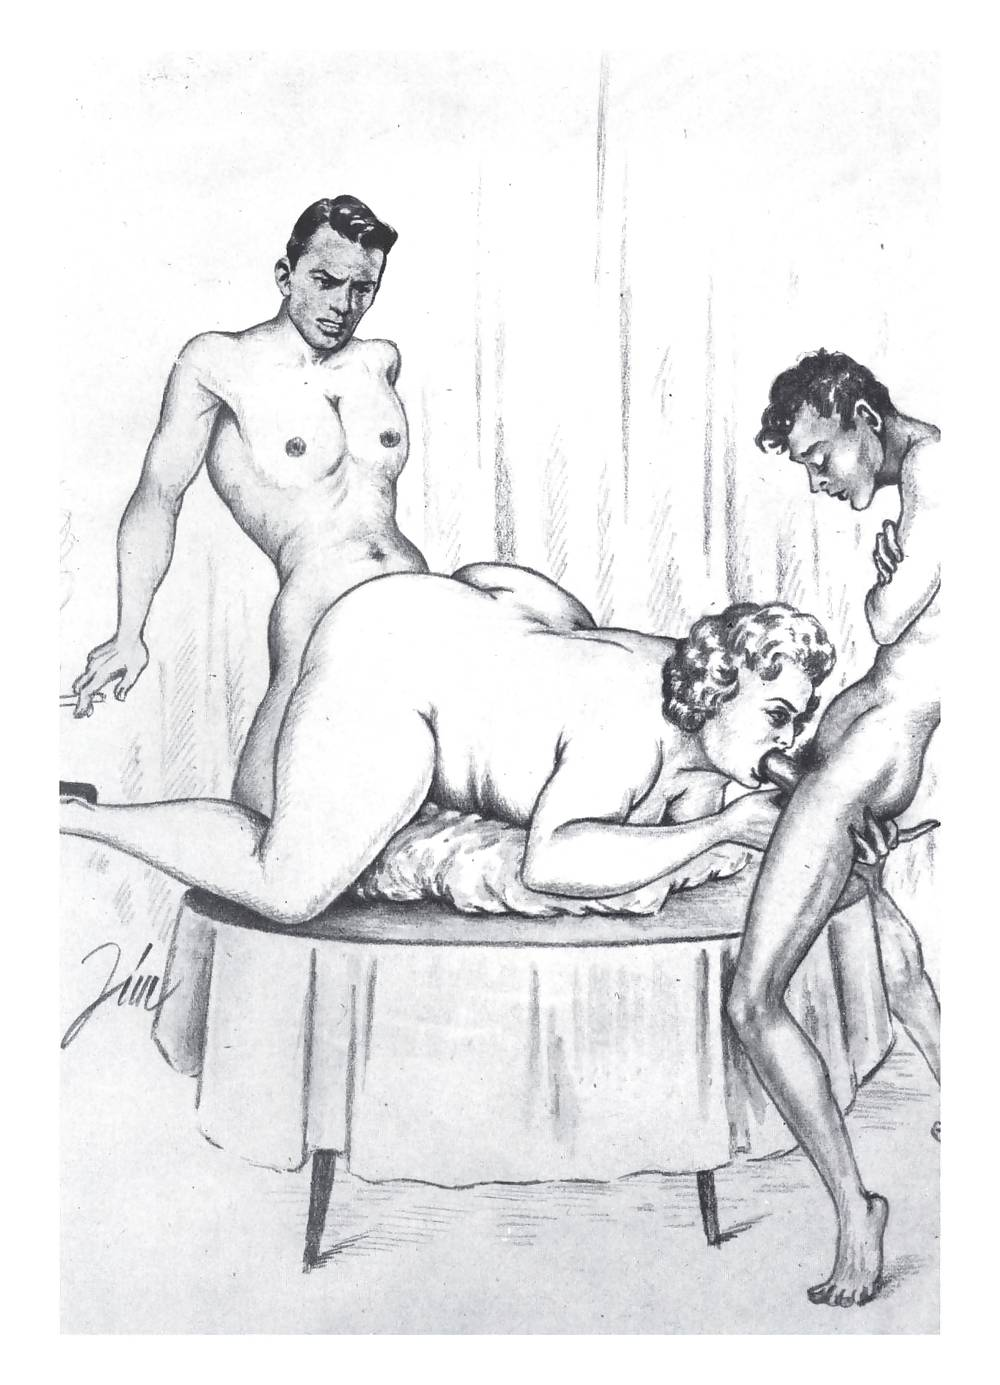 Erotic Vintage drawings Porn Pics #295991